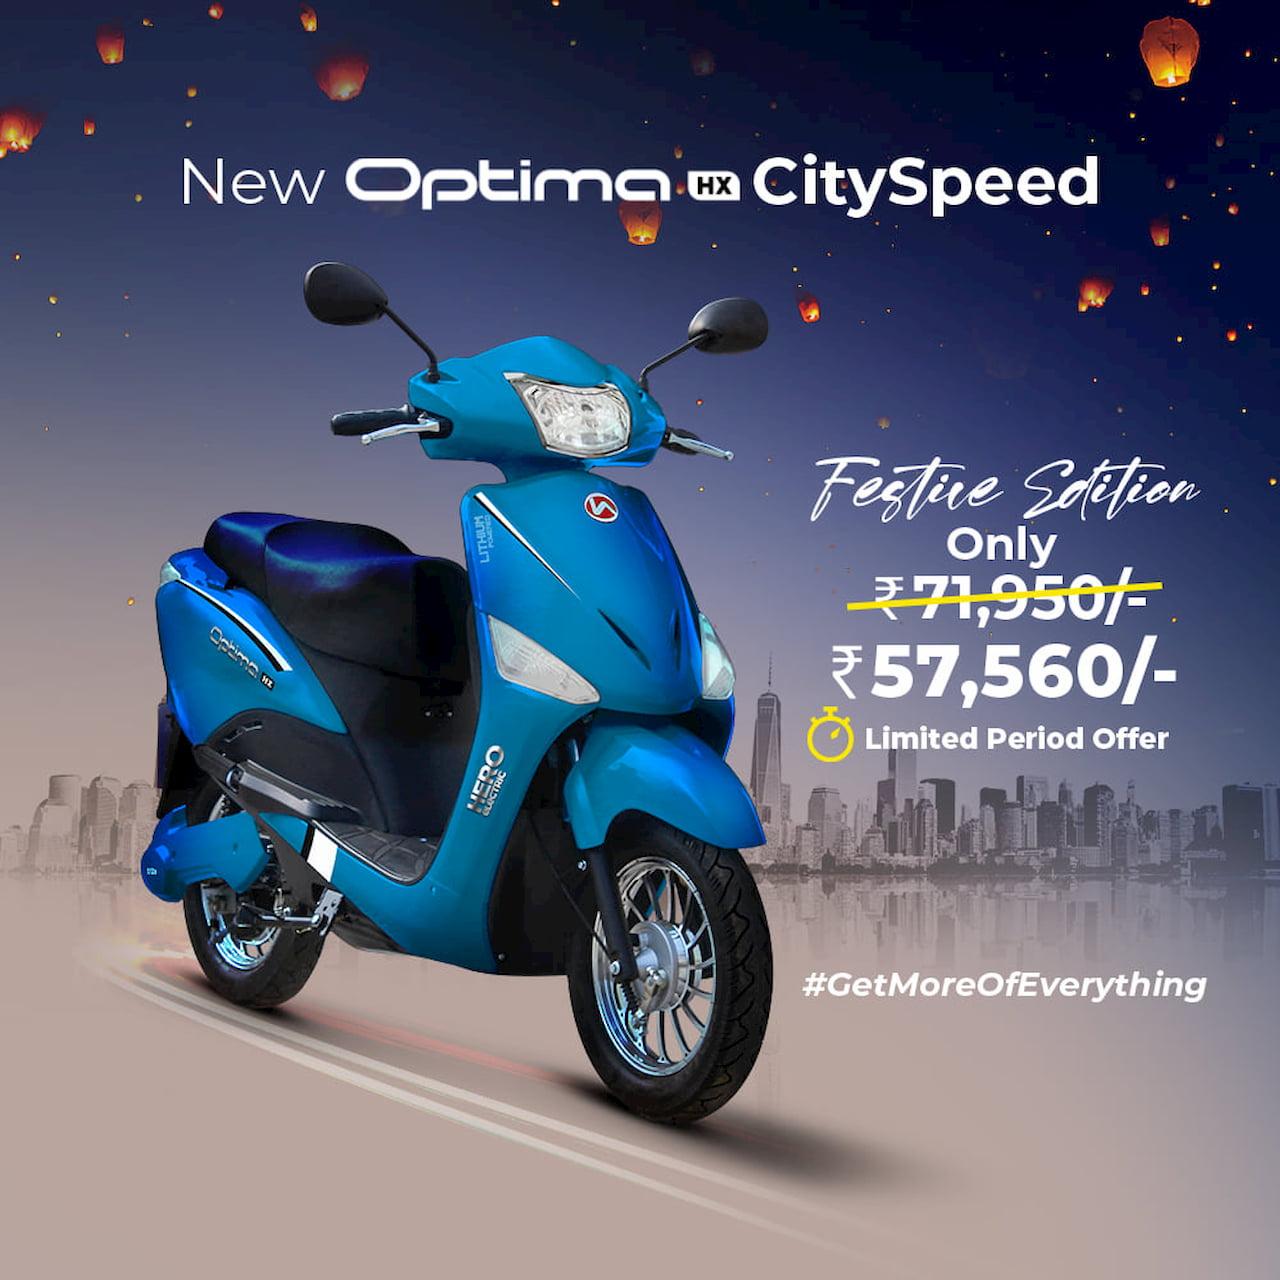 Hero Electric Optima HX blue